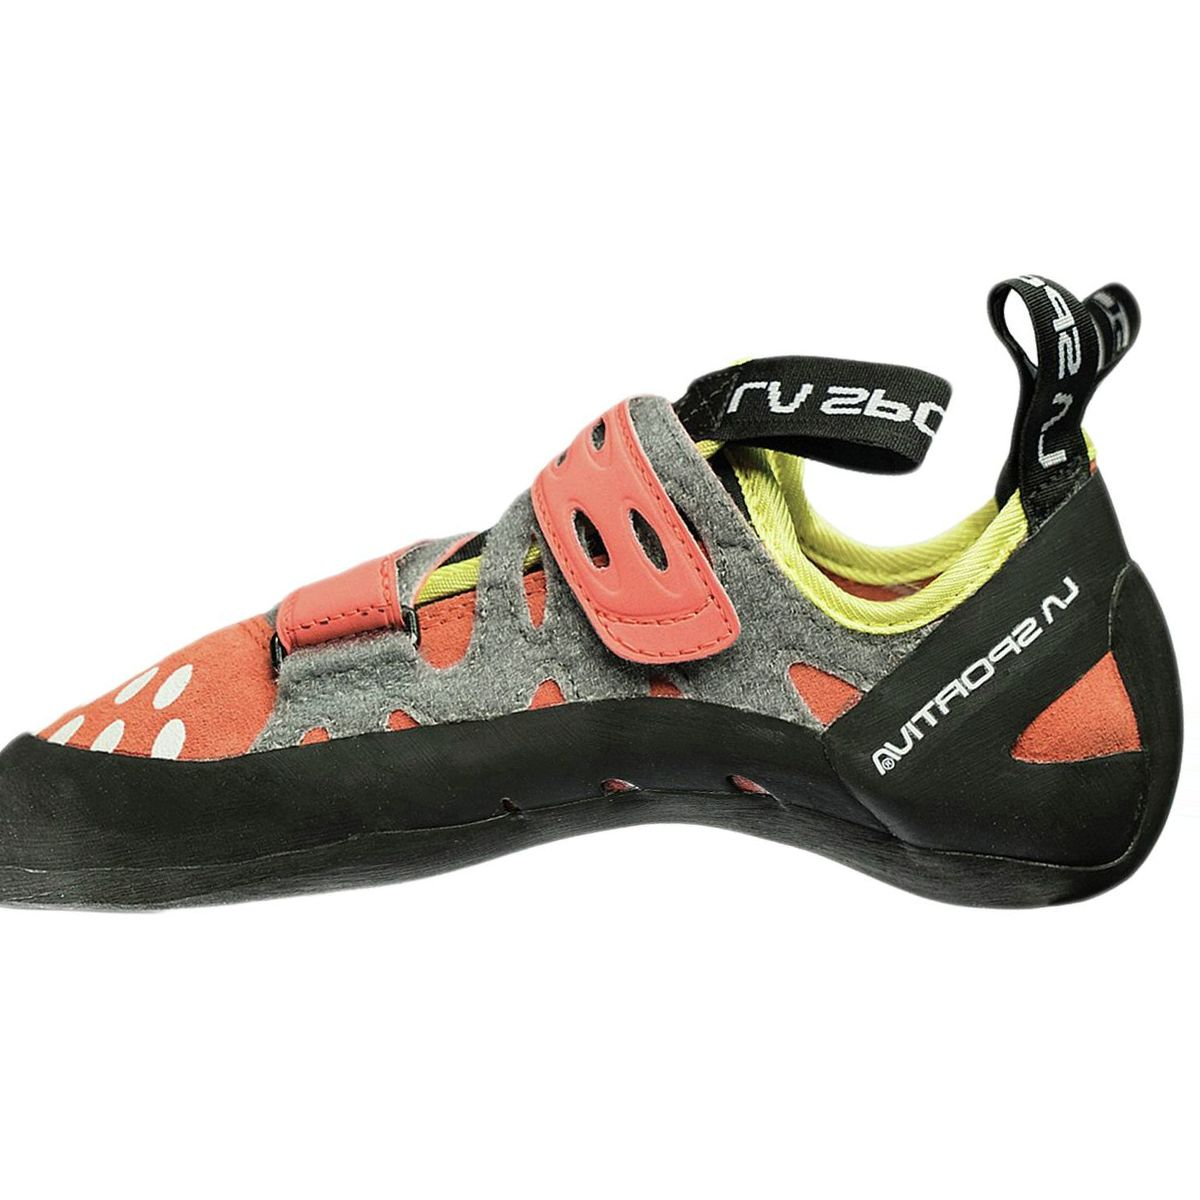 La Sportiva Tarantula Climbing Shoe - Women's